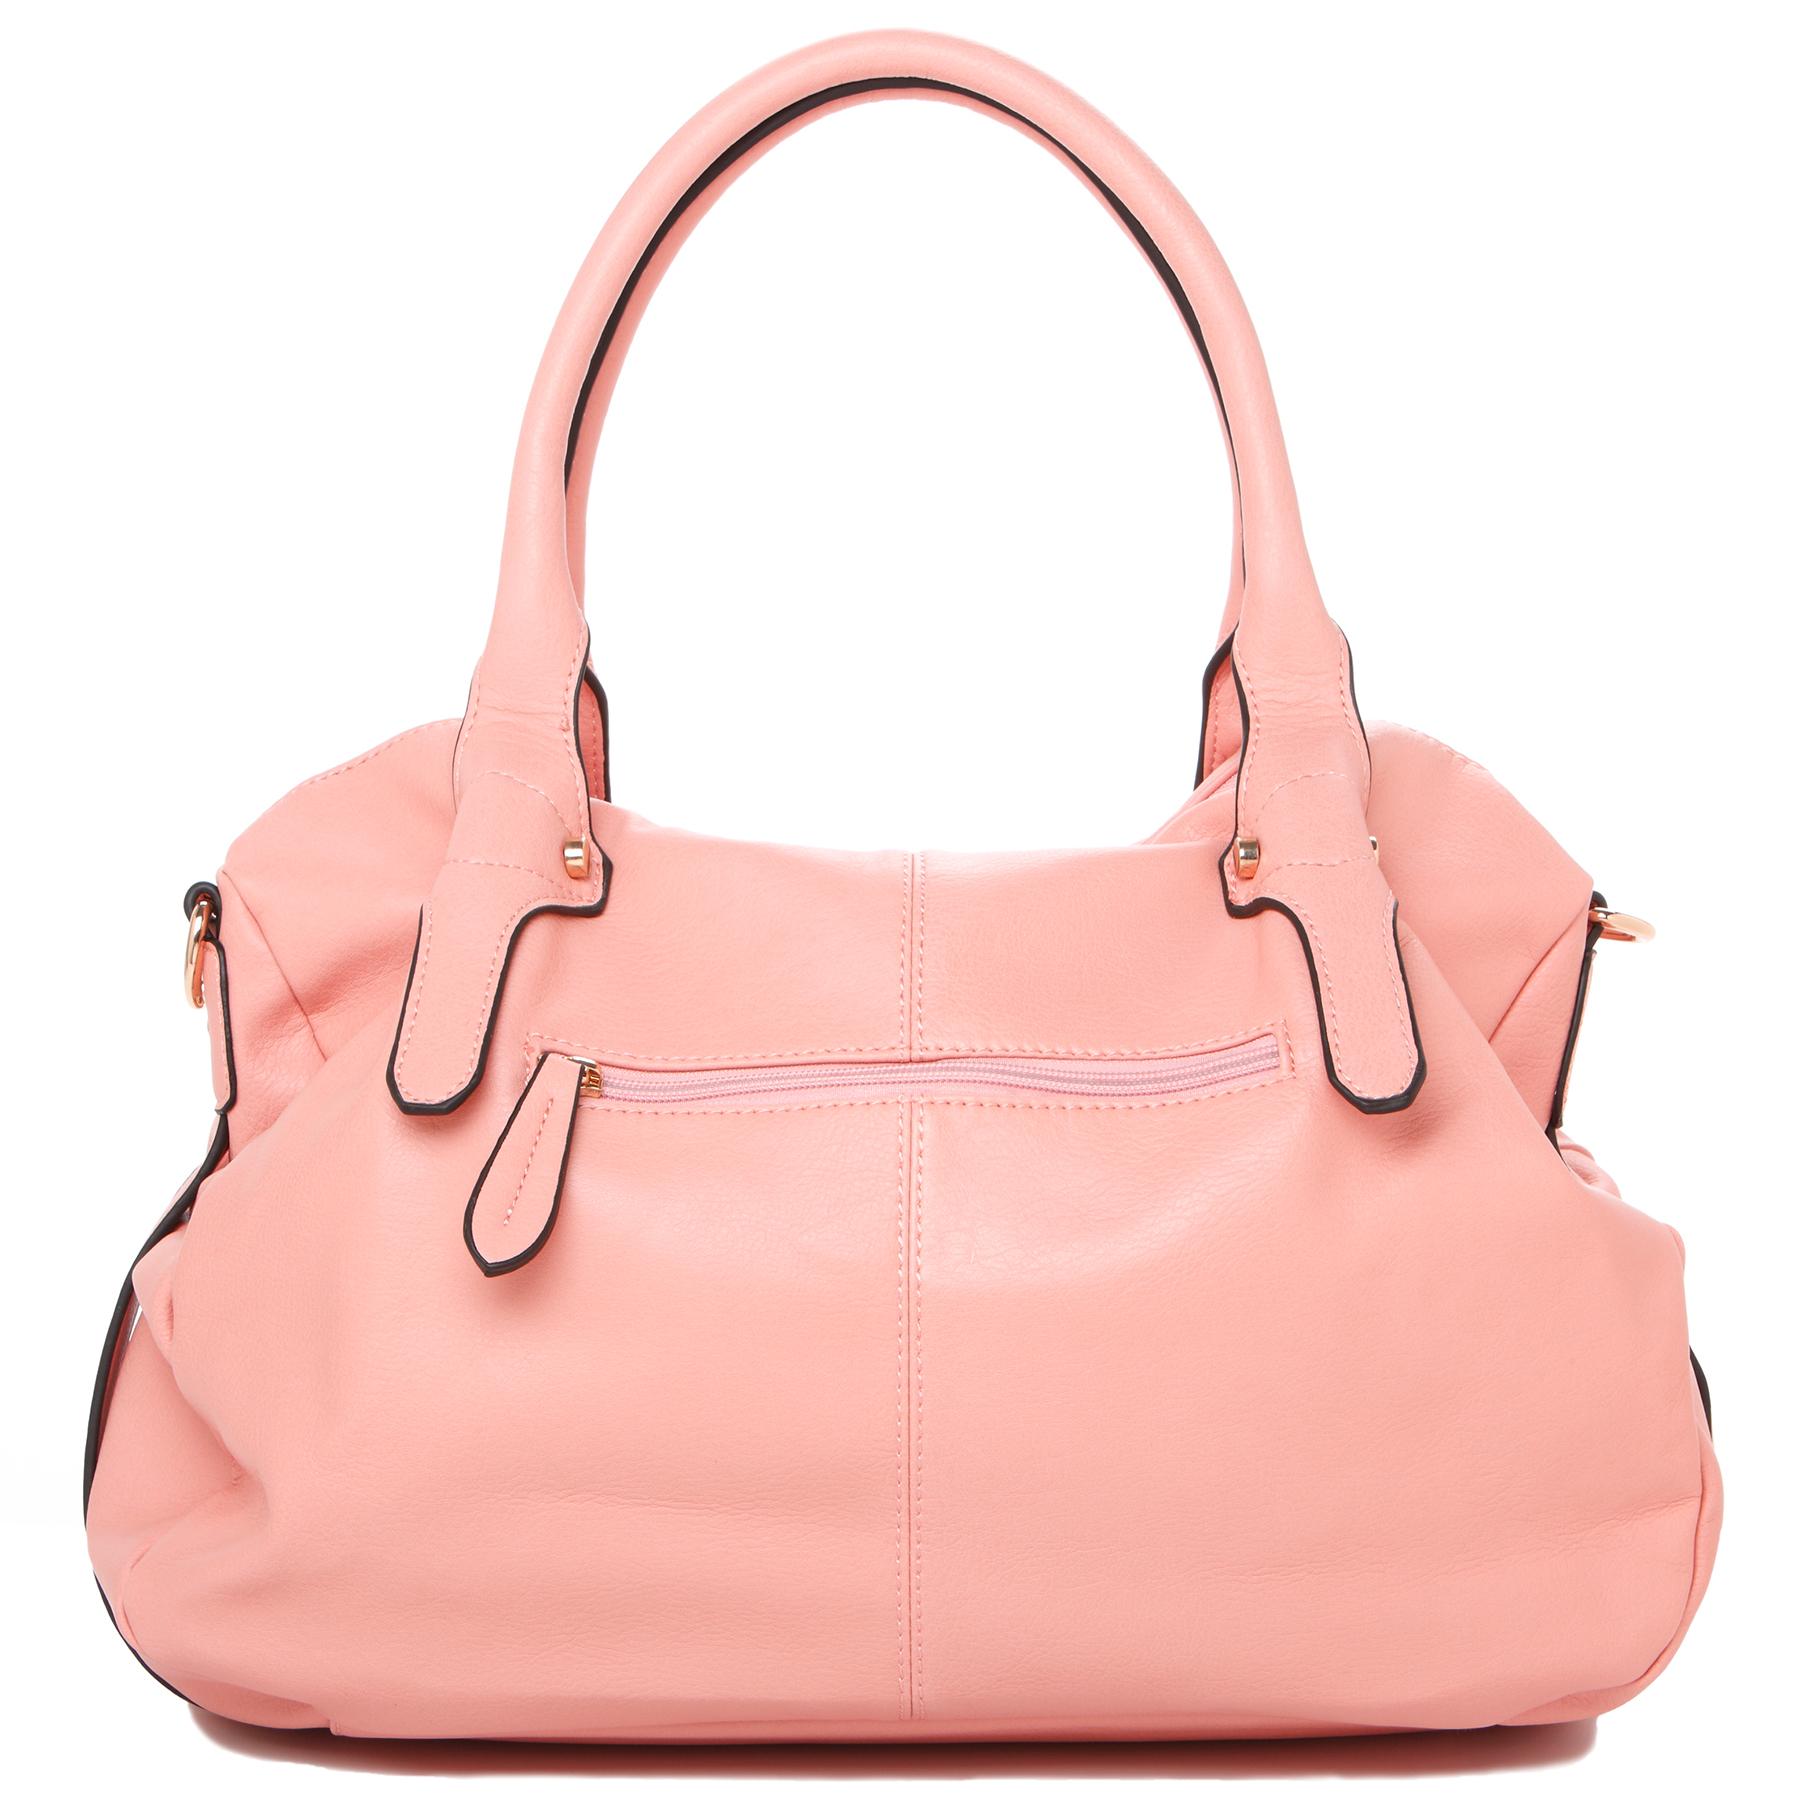 CAME Pink Office Tote Style Satchel Handbag Back